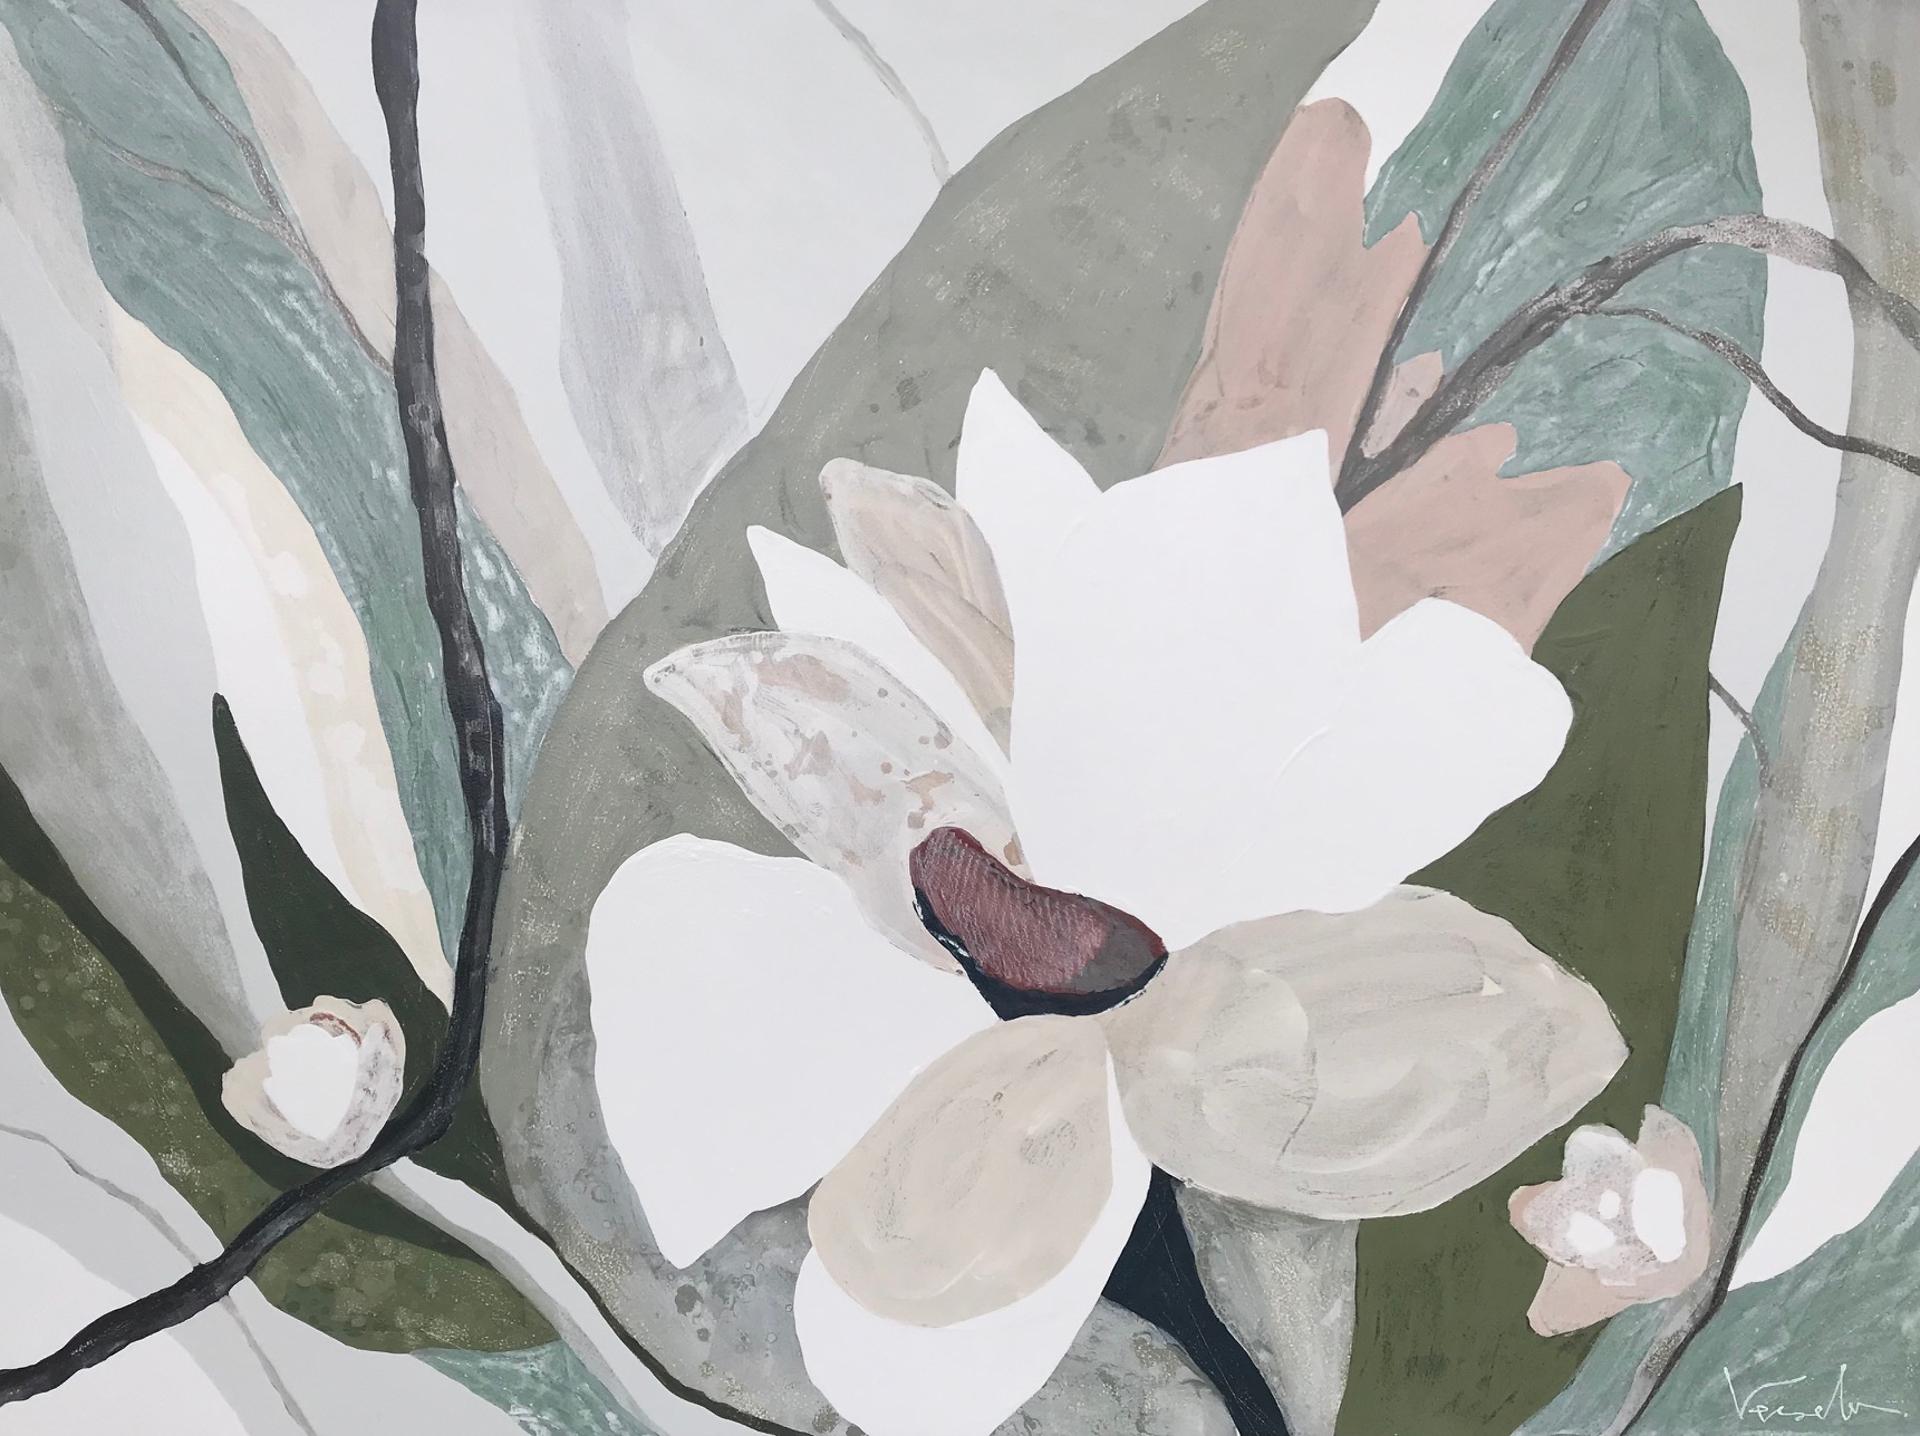 Spring by Vesela Baker